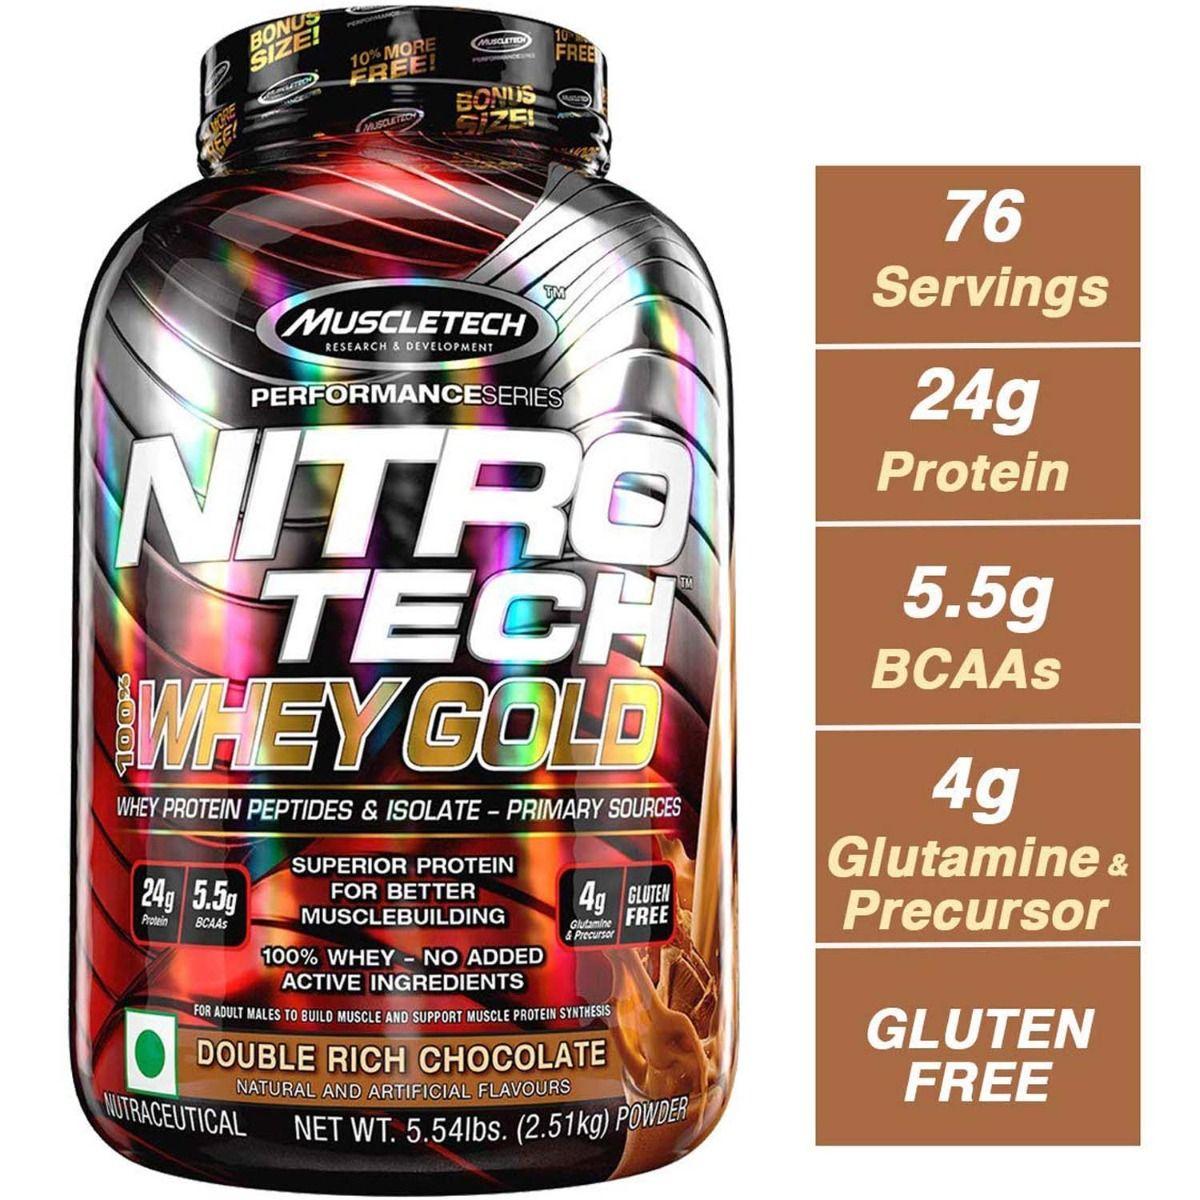 Muscletech Nitrotech Whey Chocolate 5.5 lb